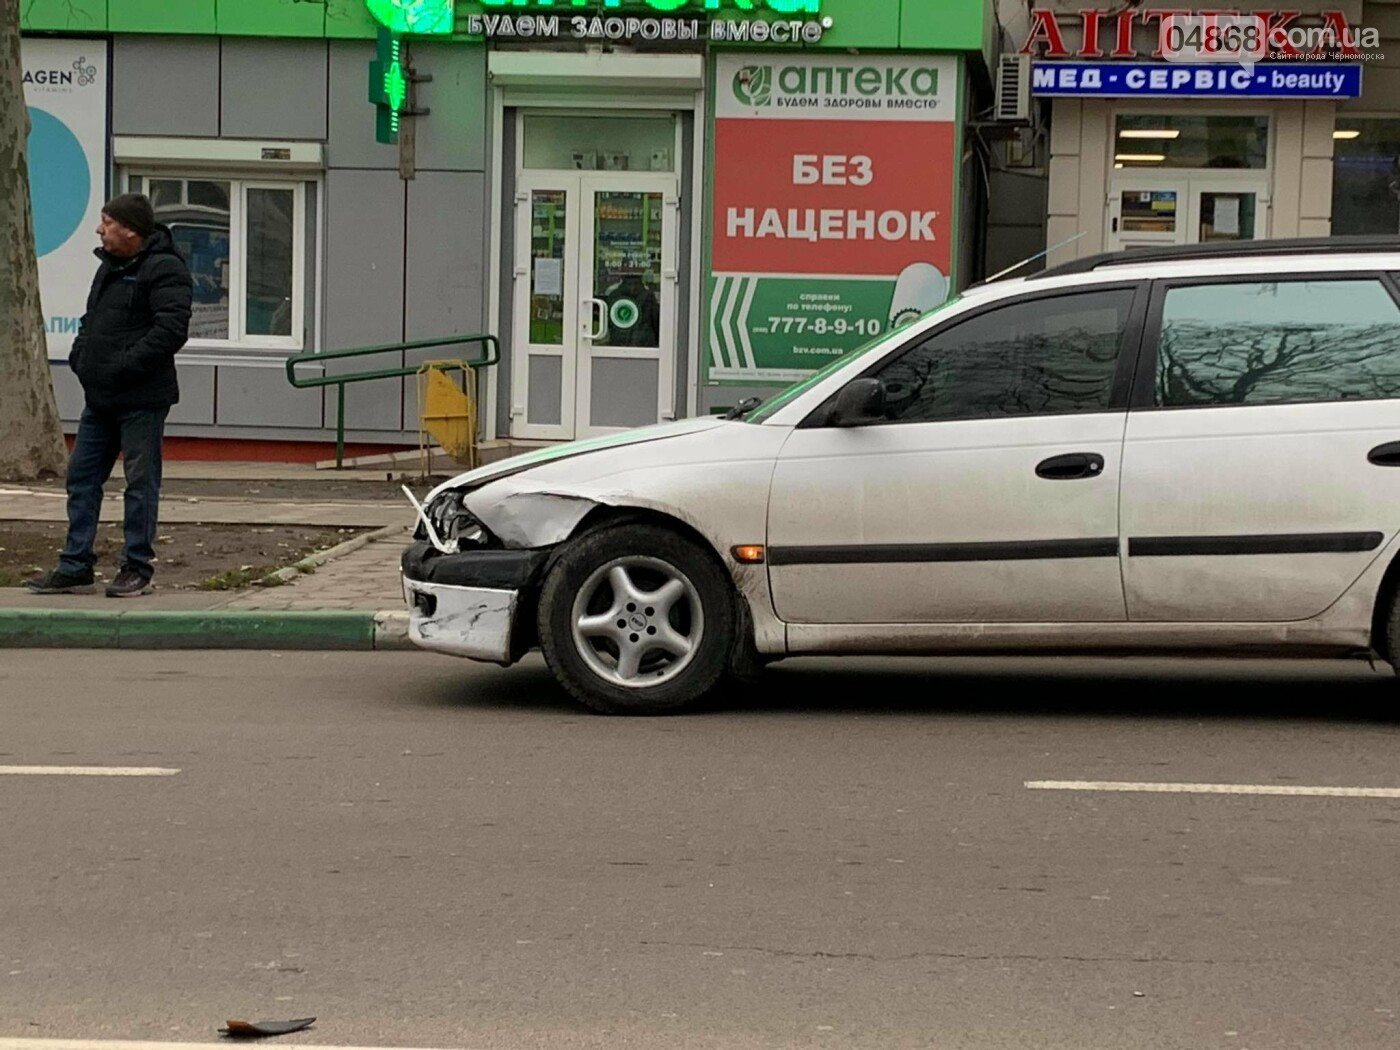 В Черноморске произошло ДТП, фото-3